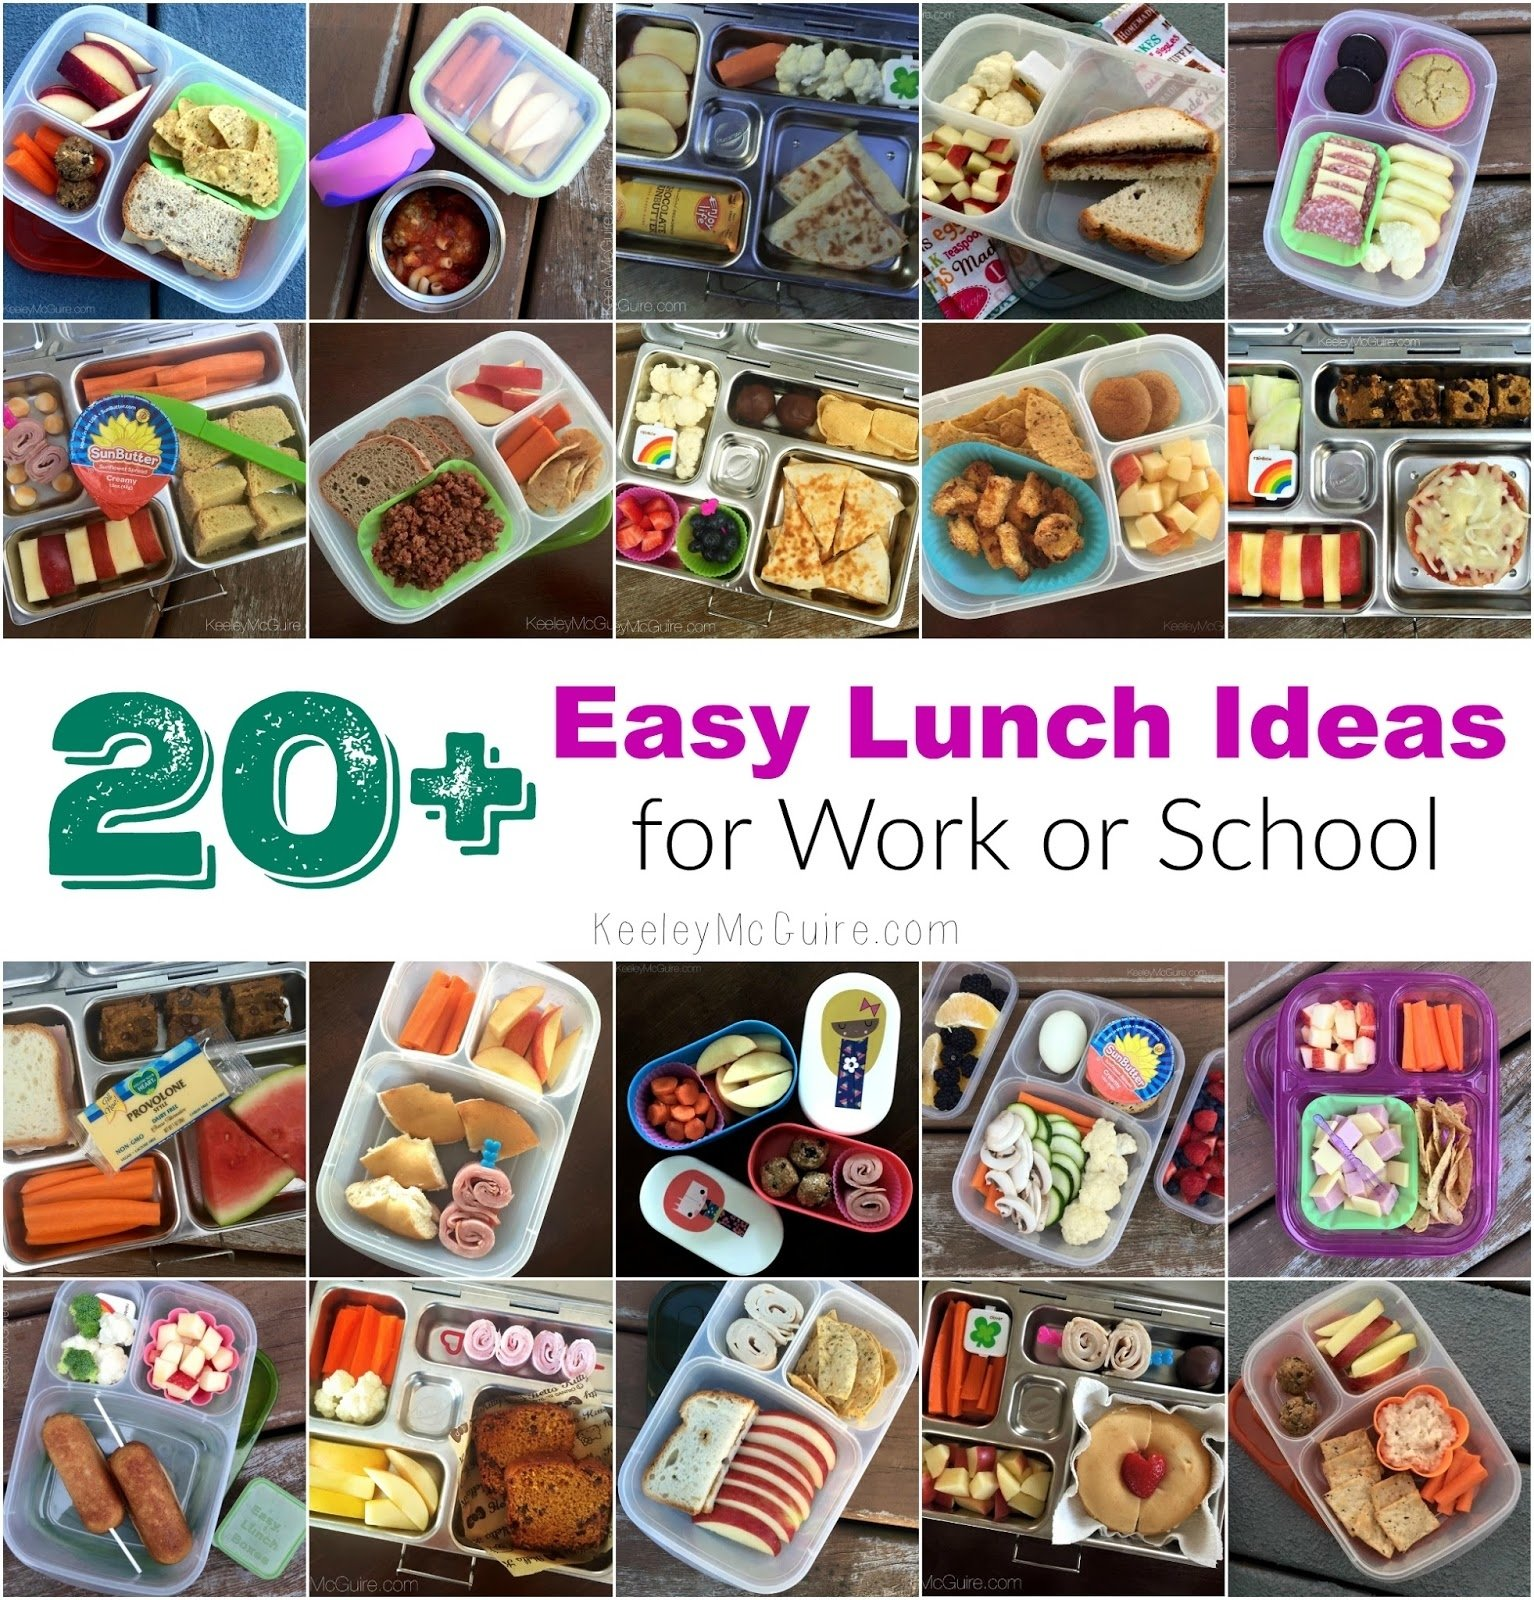 10 Elegant Quick Easy Lunch Ideas For Work gluten free allergy friendly 20 easy lunch ideas for work or school 2 2021